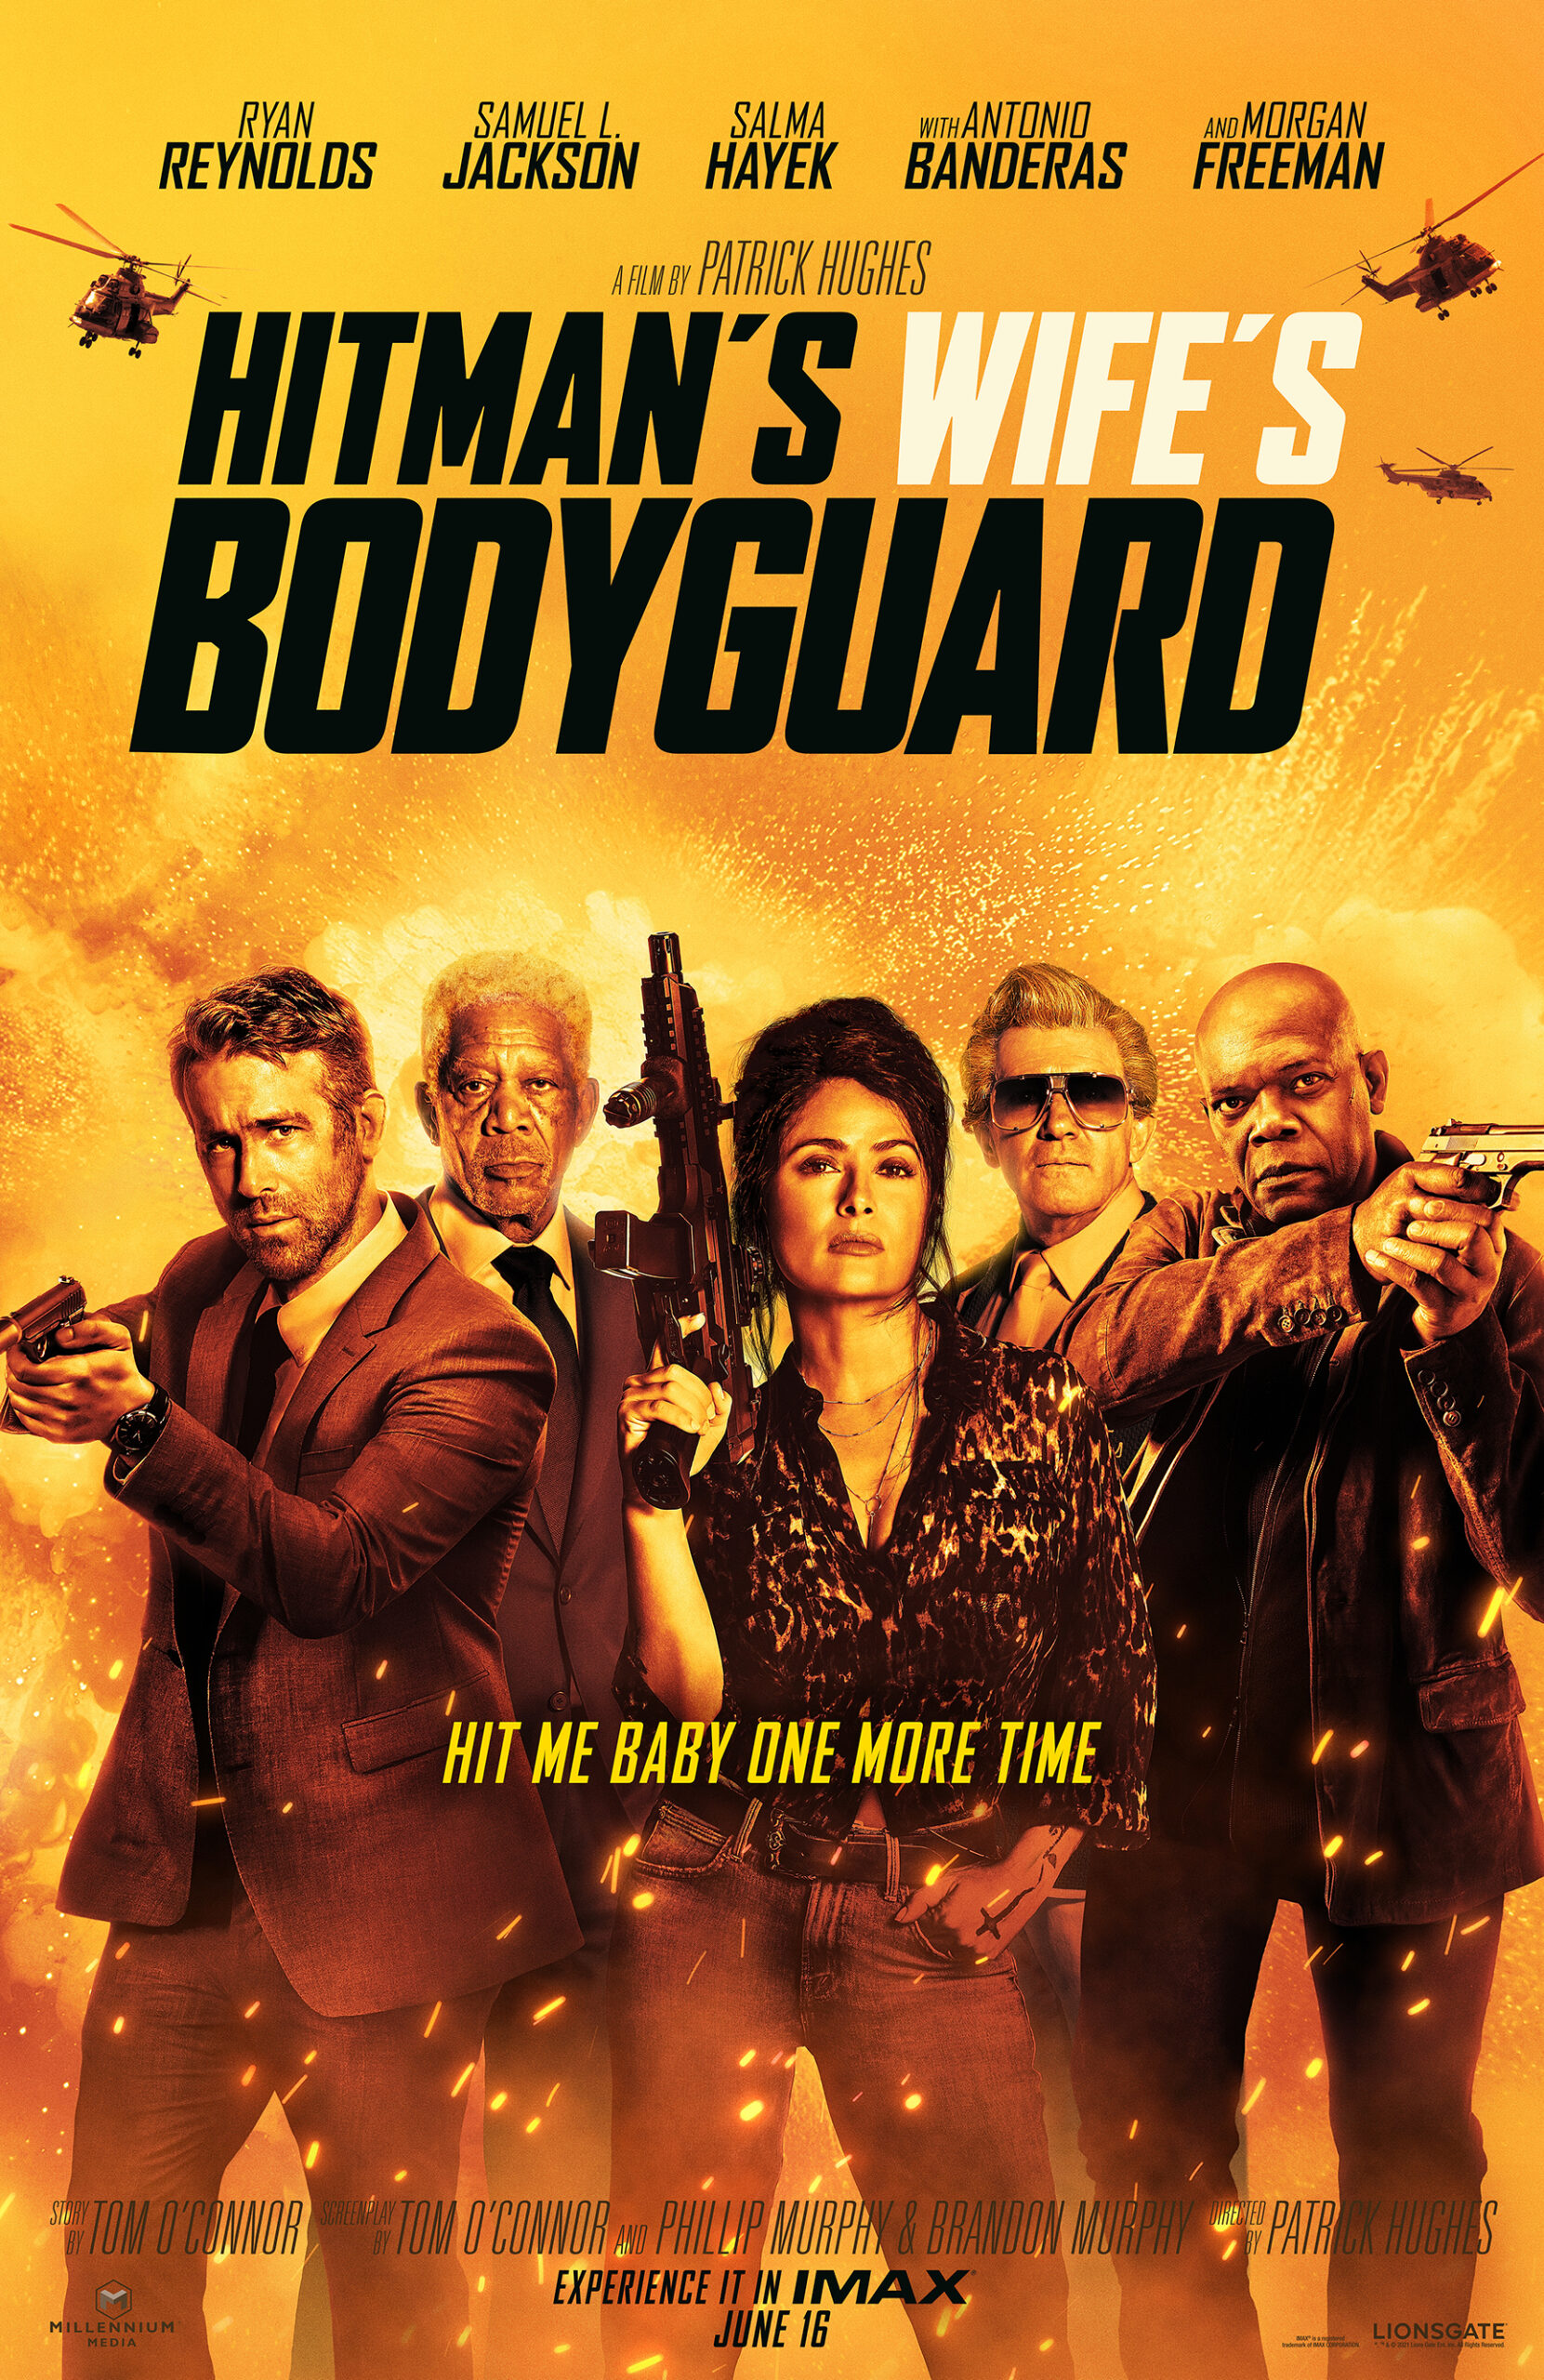 The Hitman Wife Bodyguard (2021)